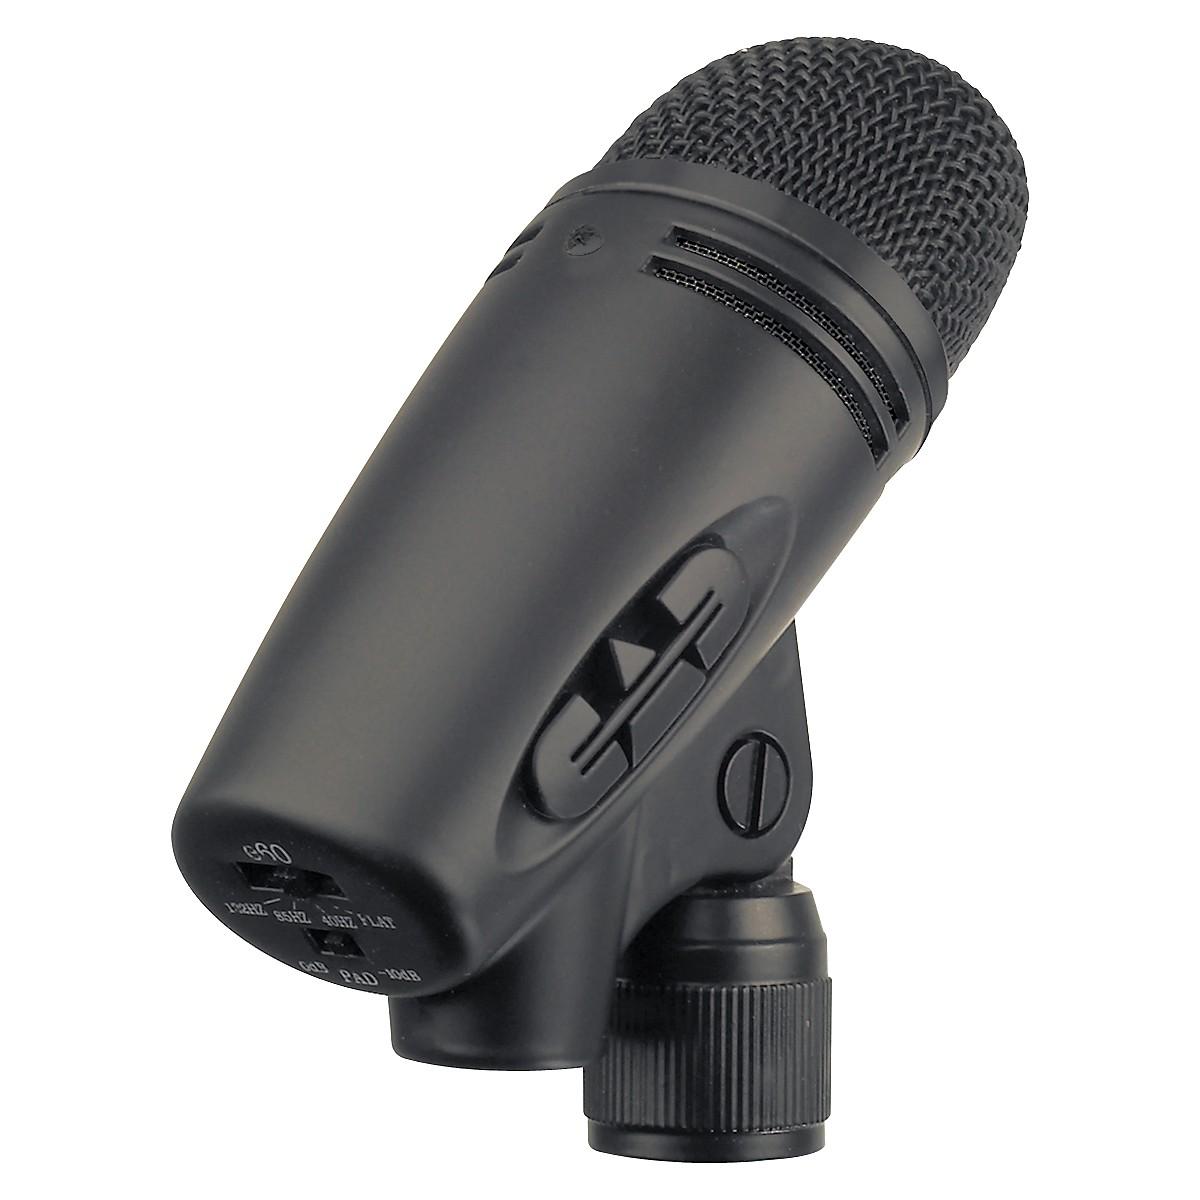 CAD e60 Cardioid Condenser Microphone